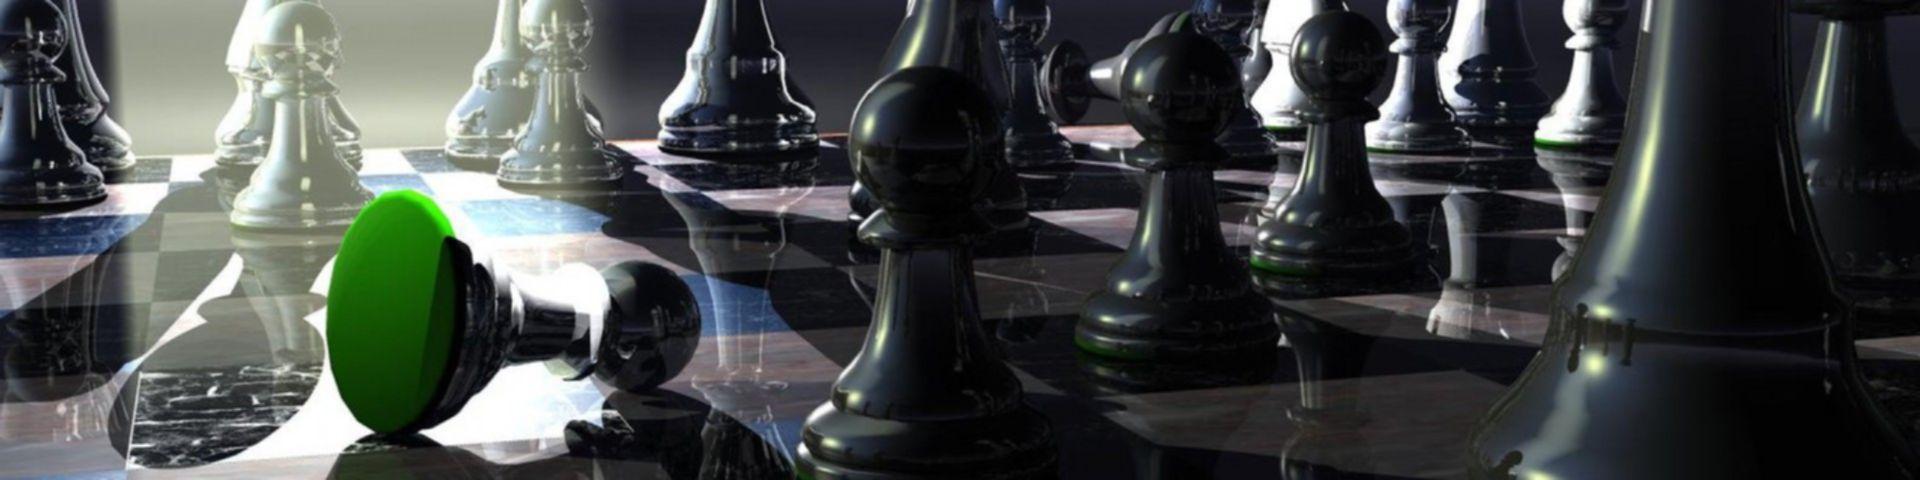 Leadership & Management Views